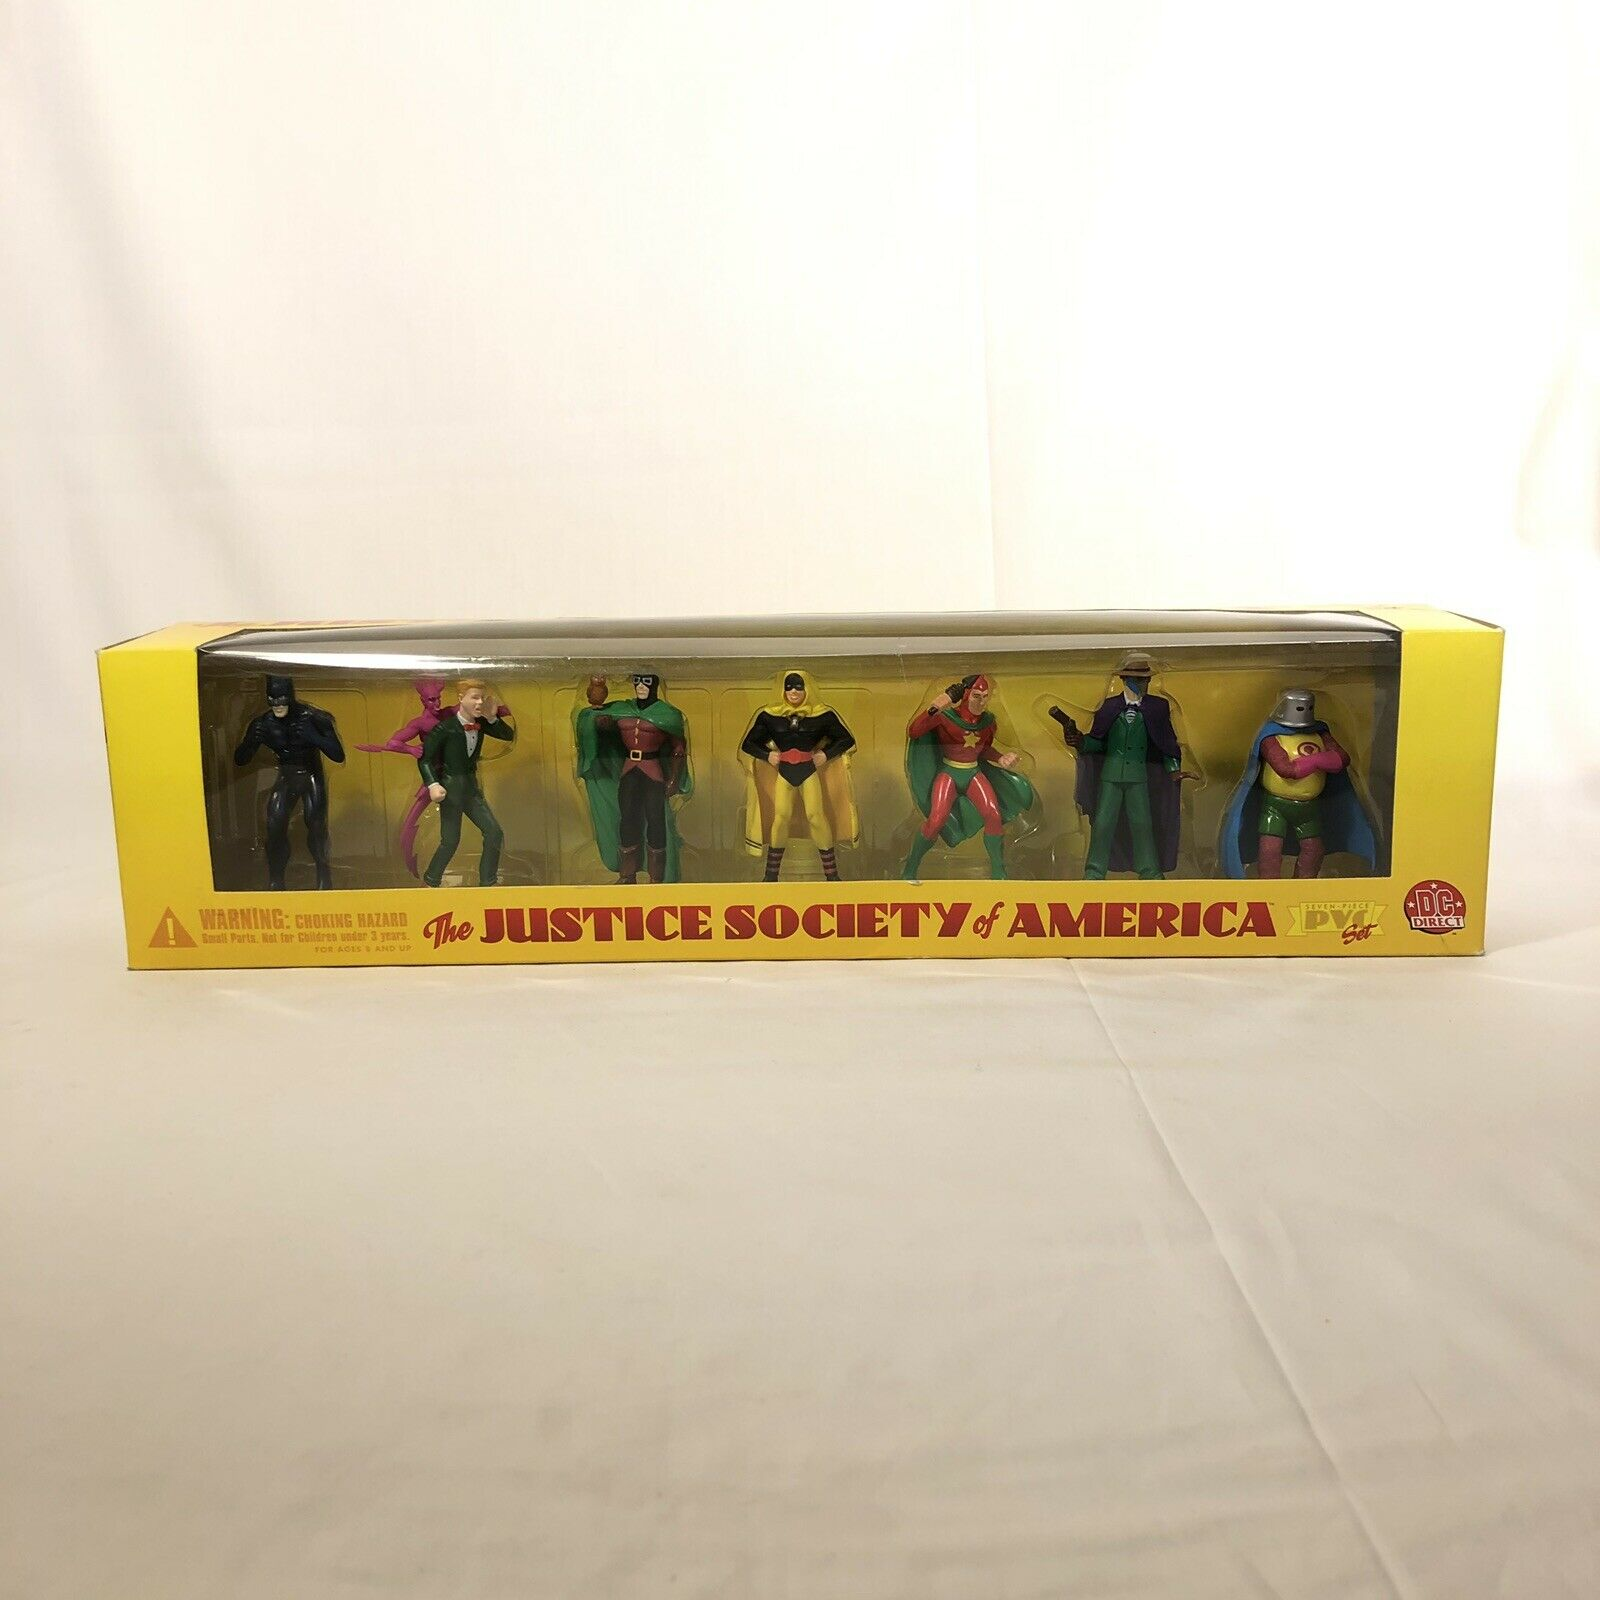 DC JUSTICE SOCIETY OF DIRECT AMERICA PVC Set 1999 HOURuomo Seuomo WILDCAT estrellama